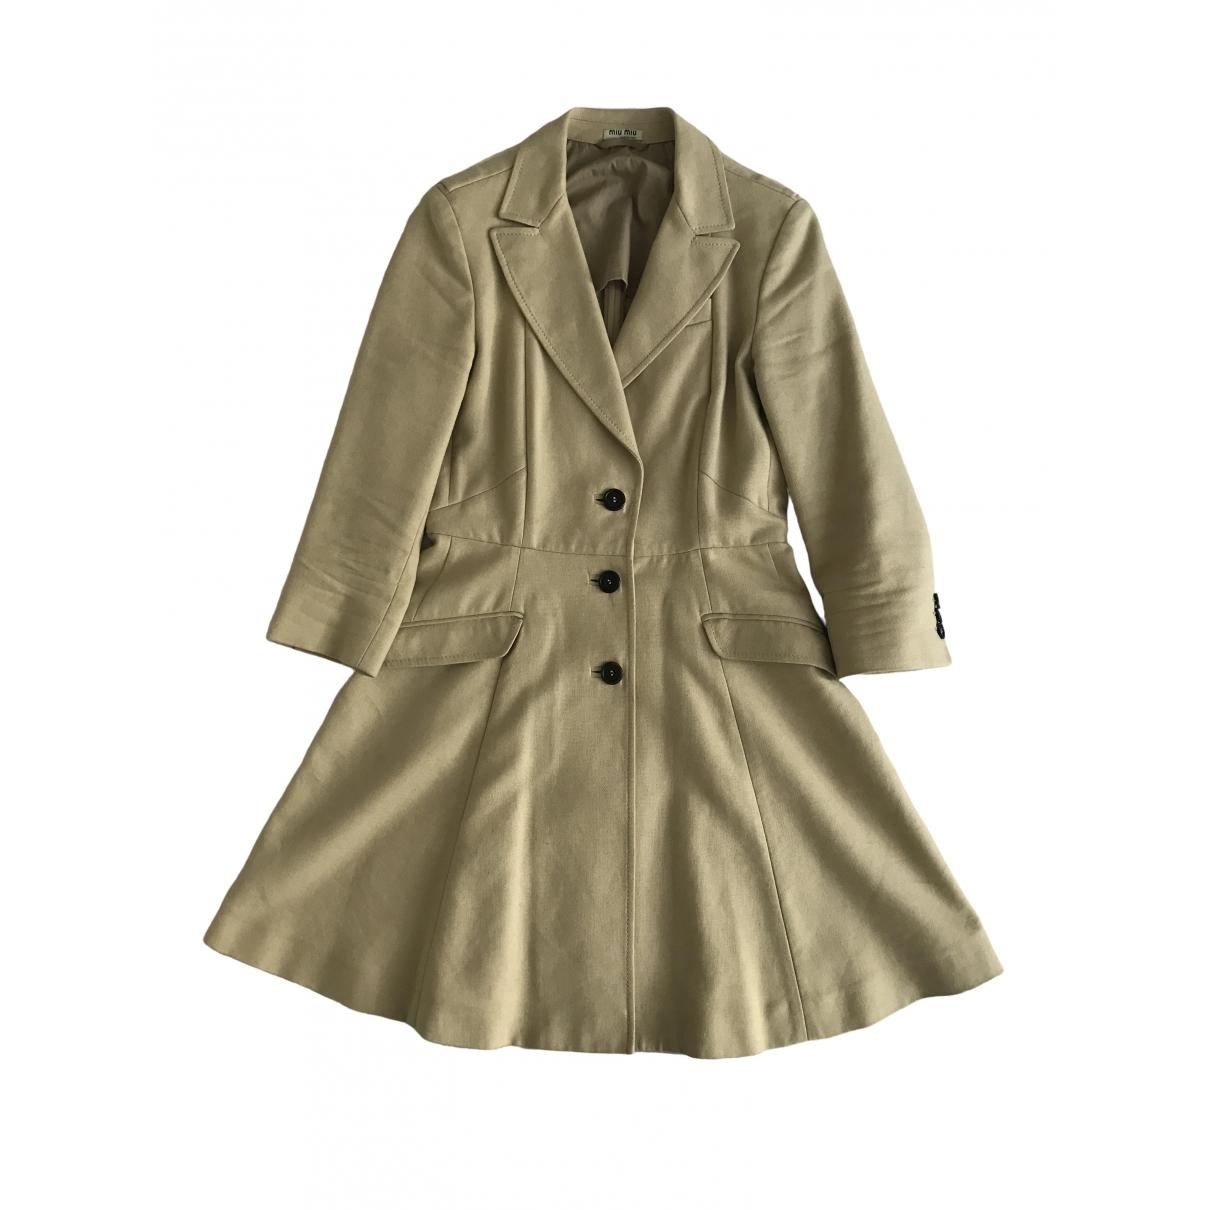 Miu Miu \N Ecru Cotton coat for Women 40 IT